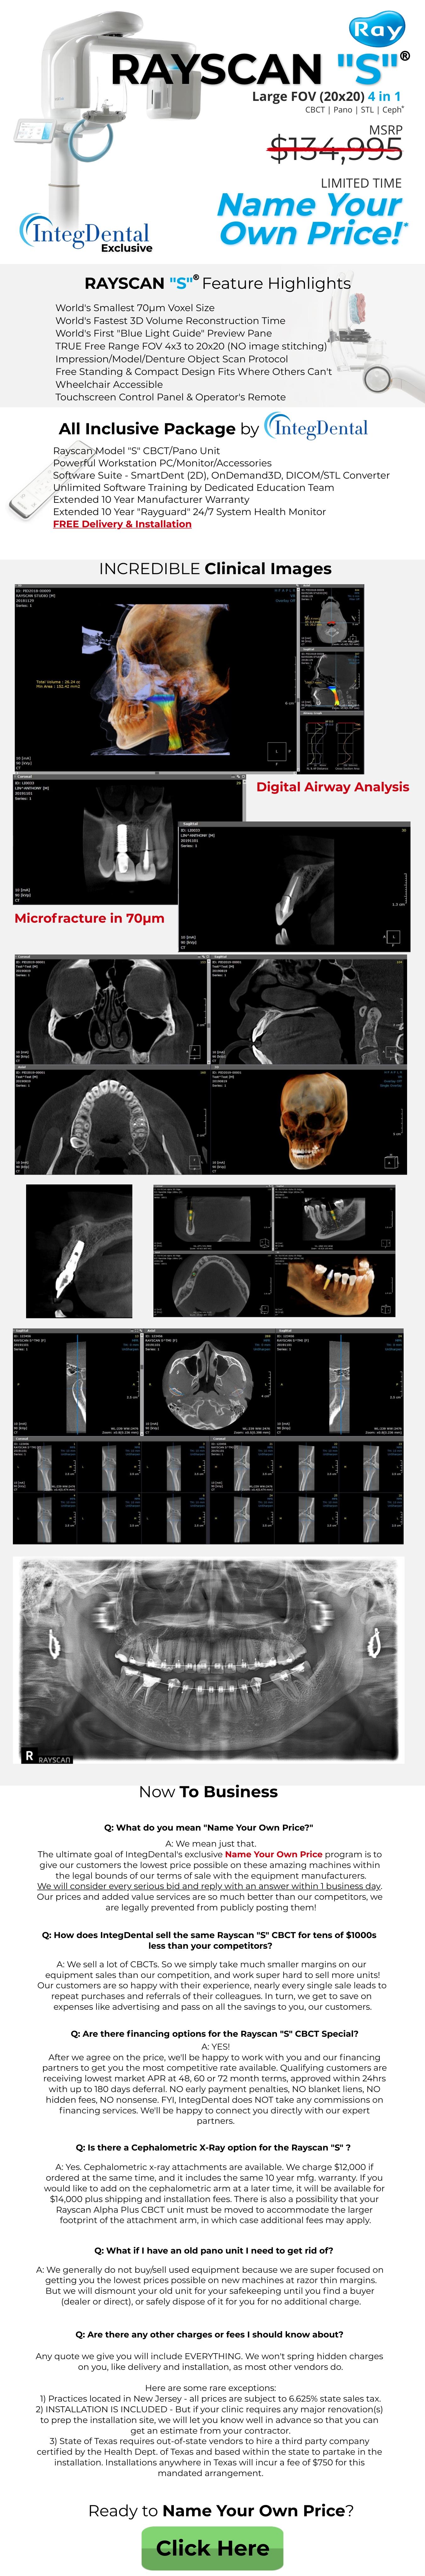 nyop-rayscan-s-page-feb-2021-1-.jpg